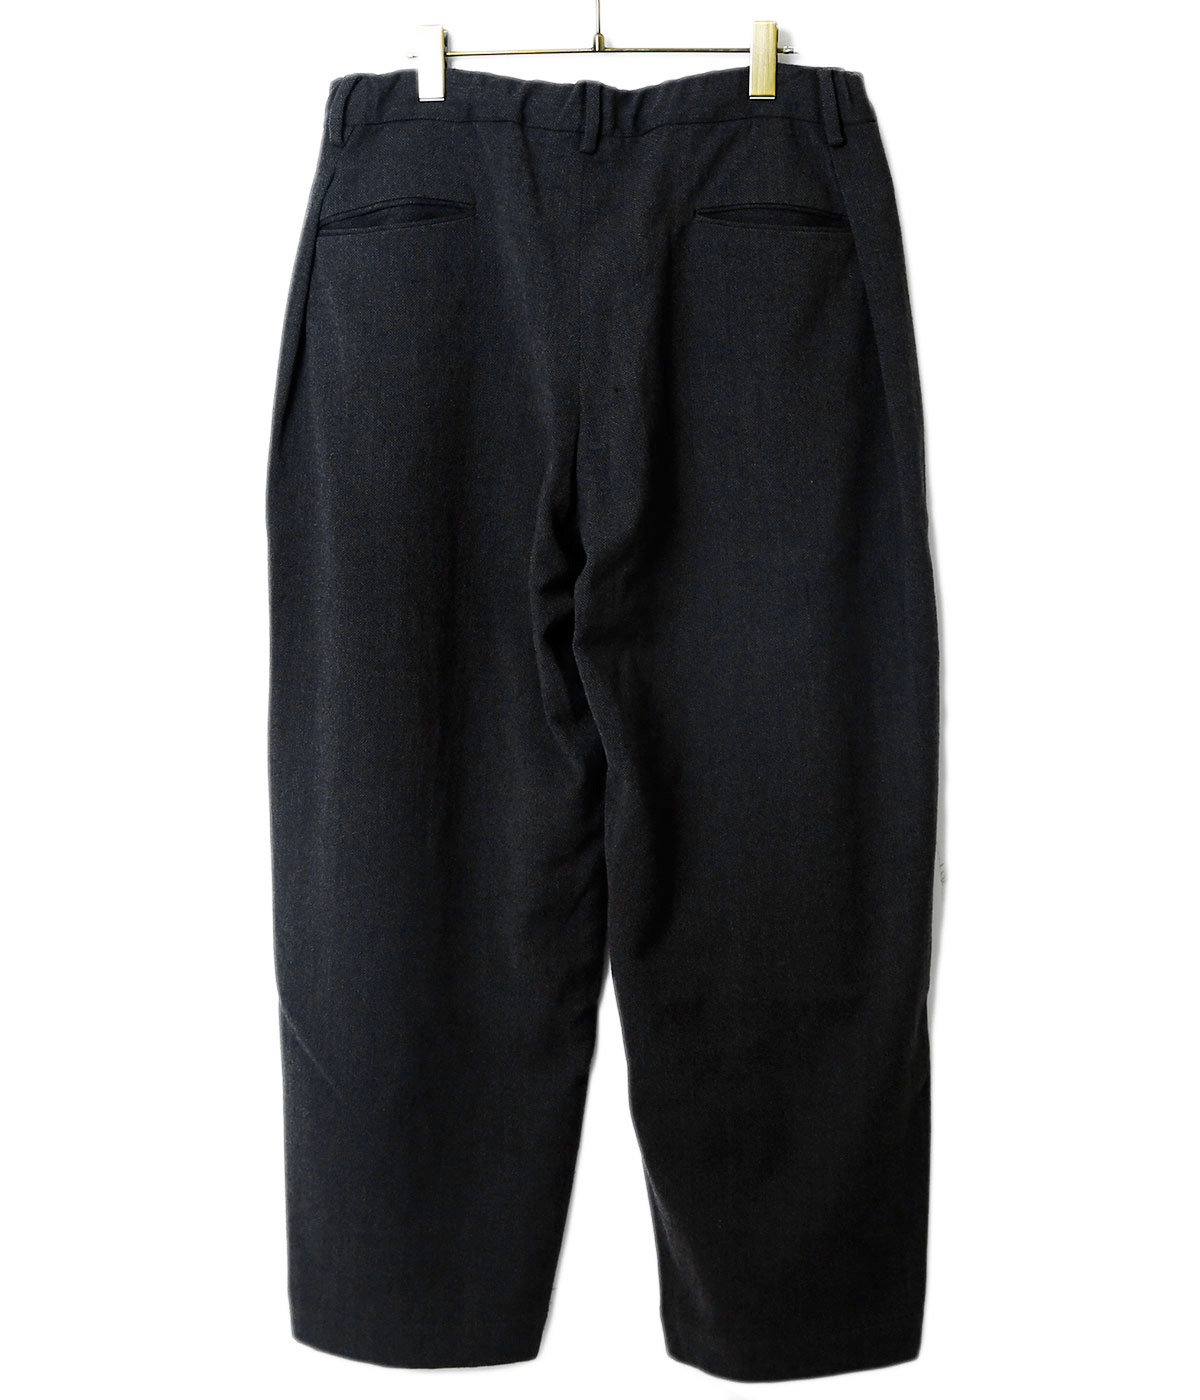 Washble Wool RATINE W-TUCK PANTS